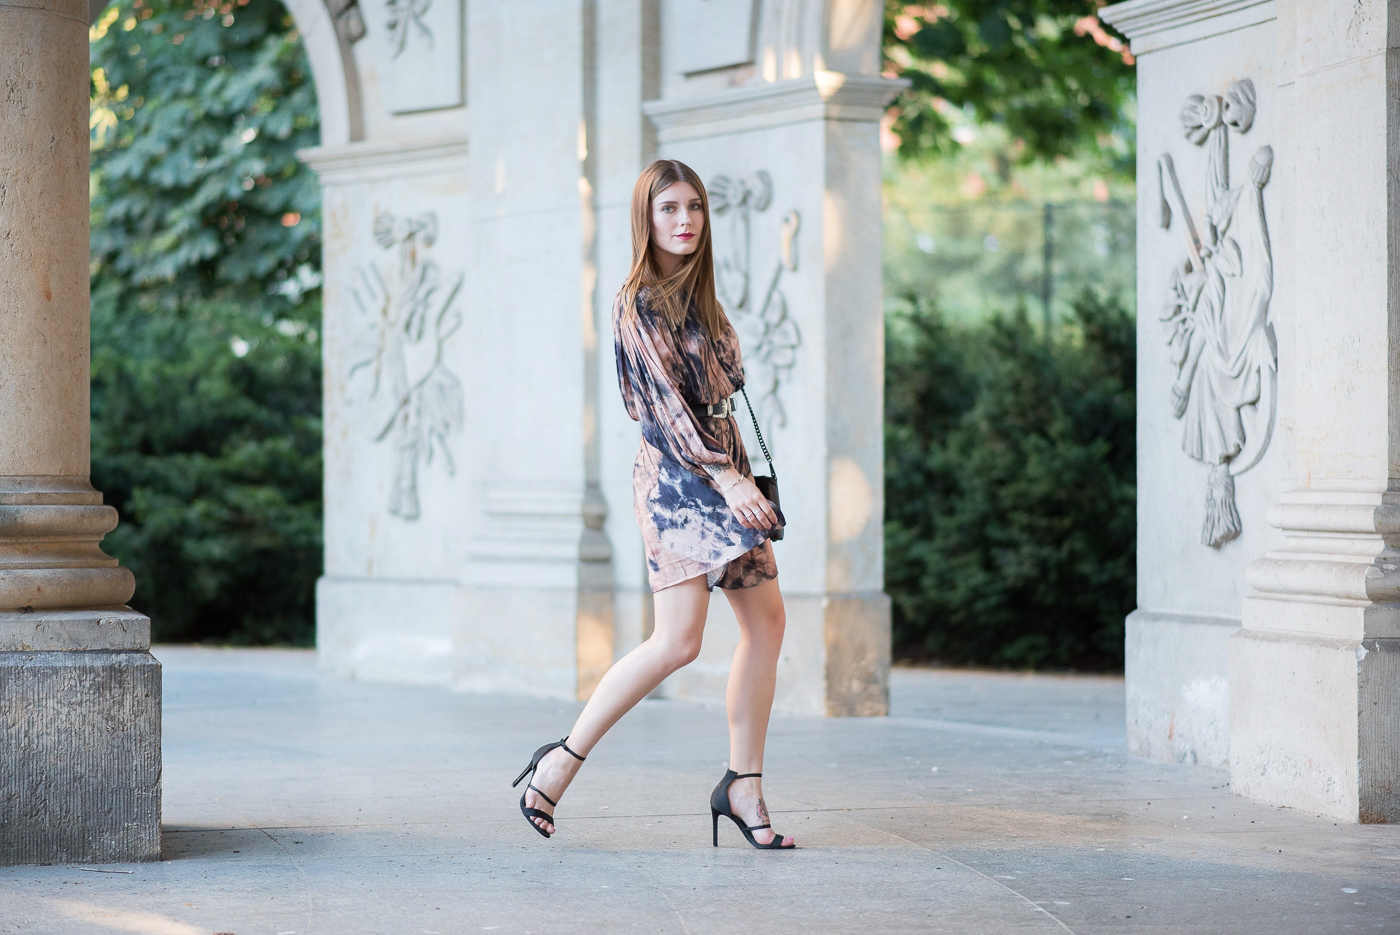 Berlin_Fashion_Week_Ready_Outfit_5